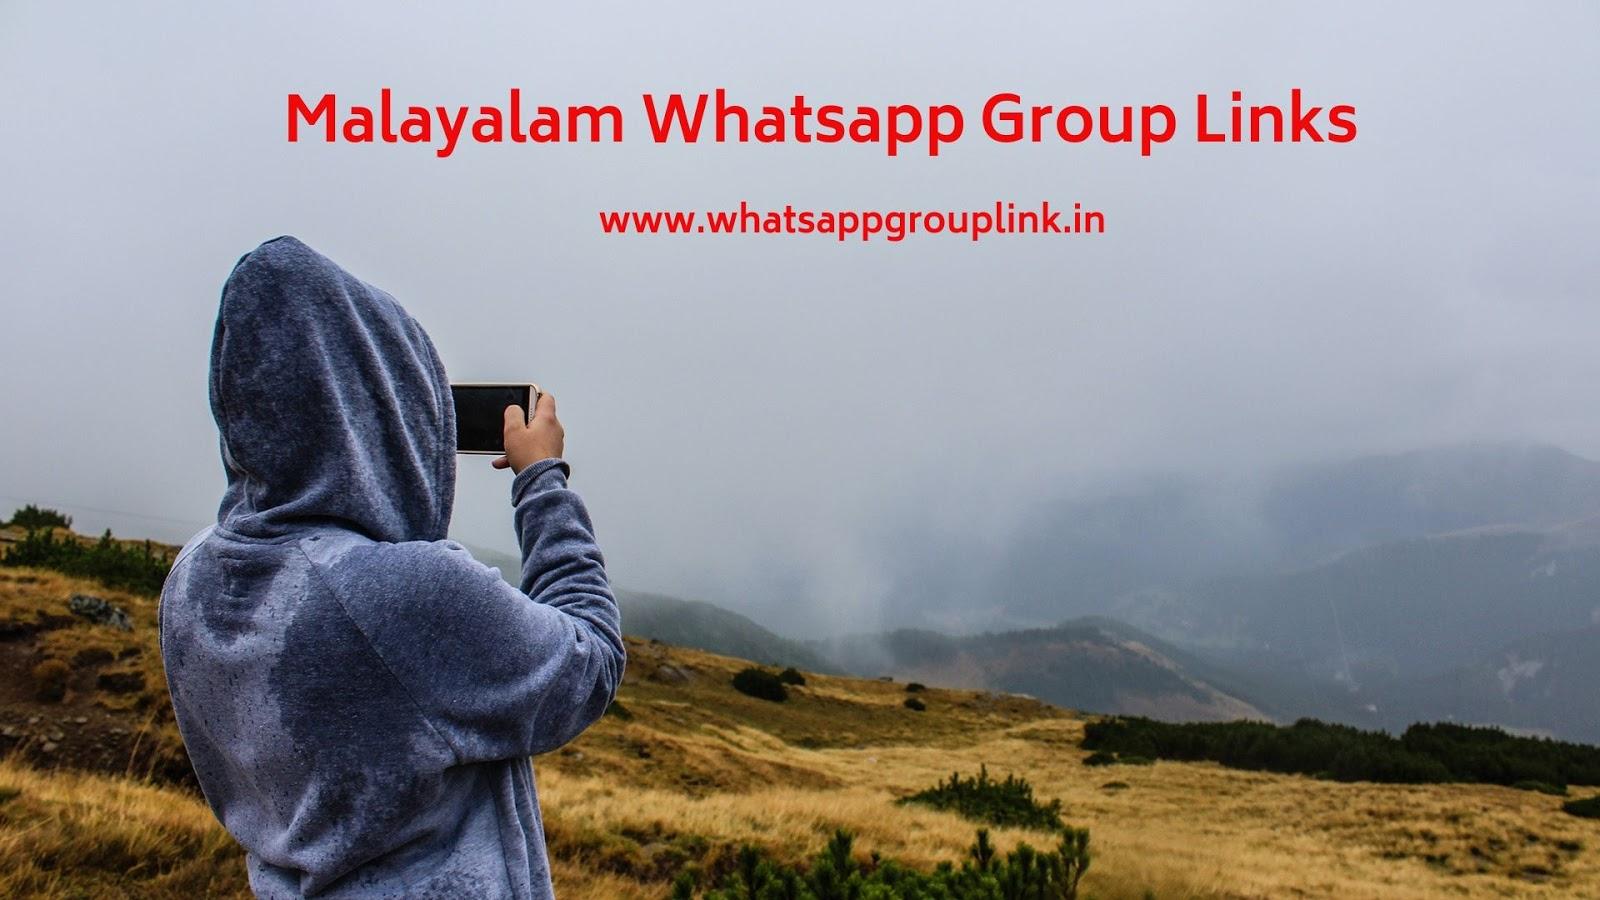 Whatsapp Group Link: Malayalam Whatsapp Group Links